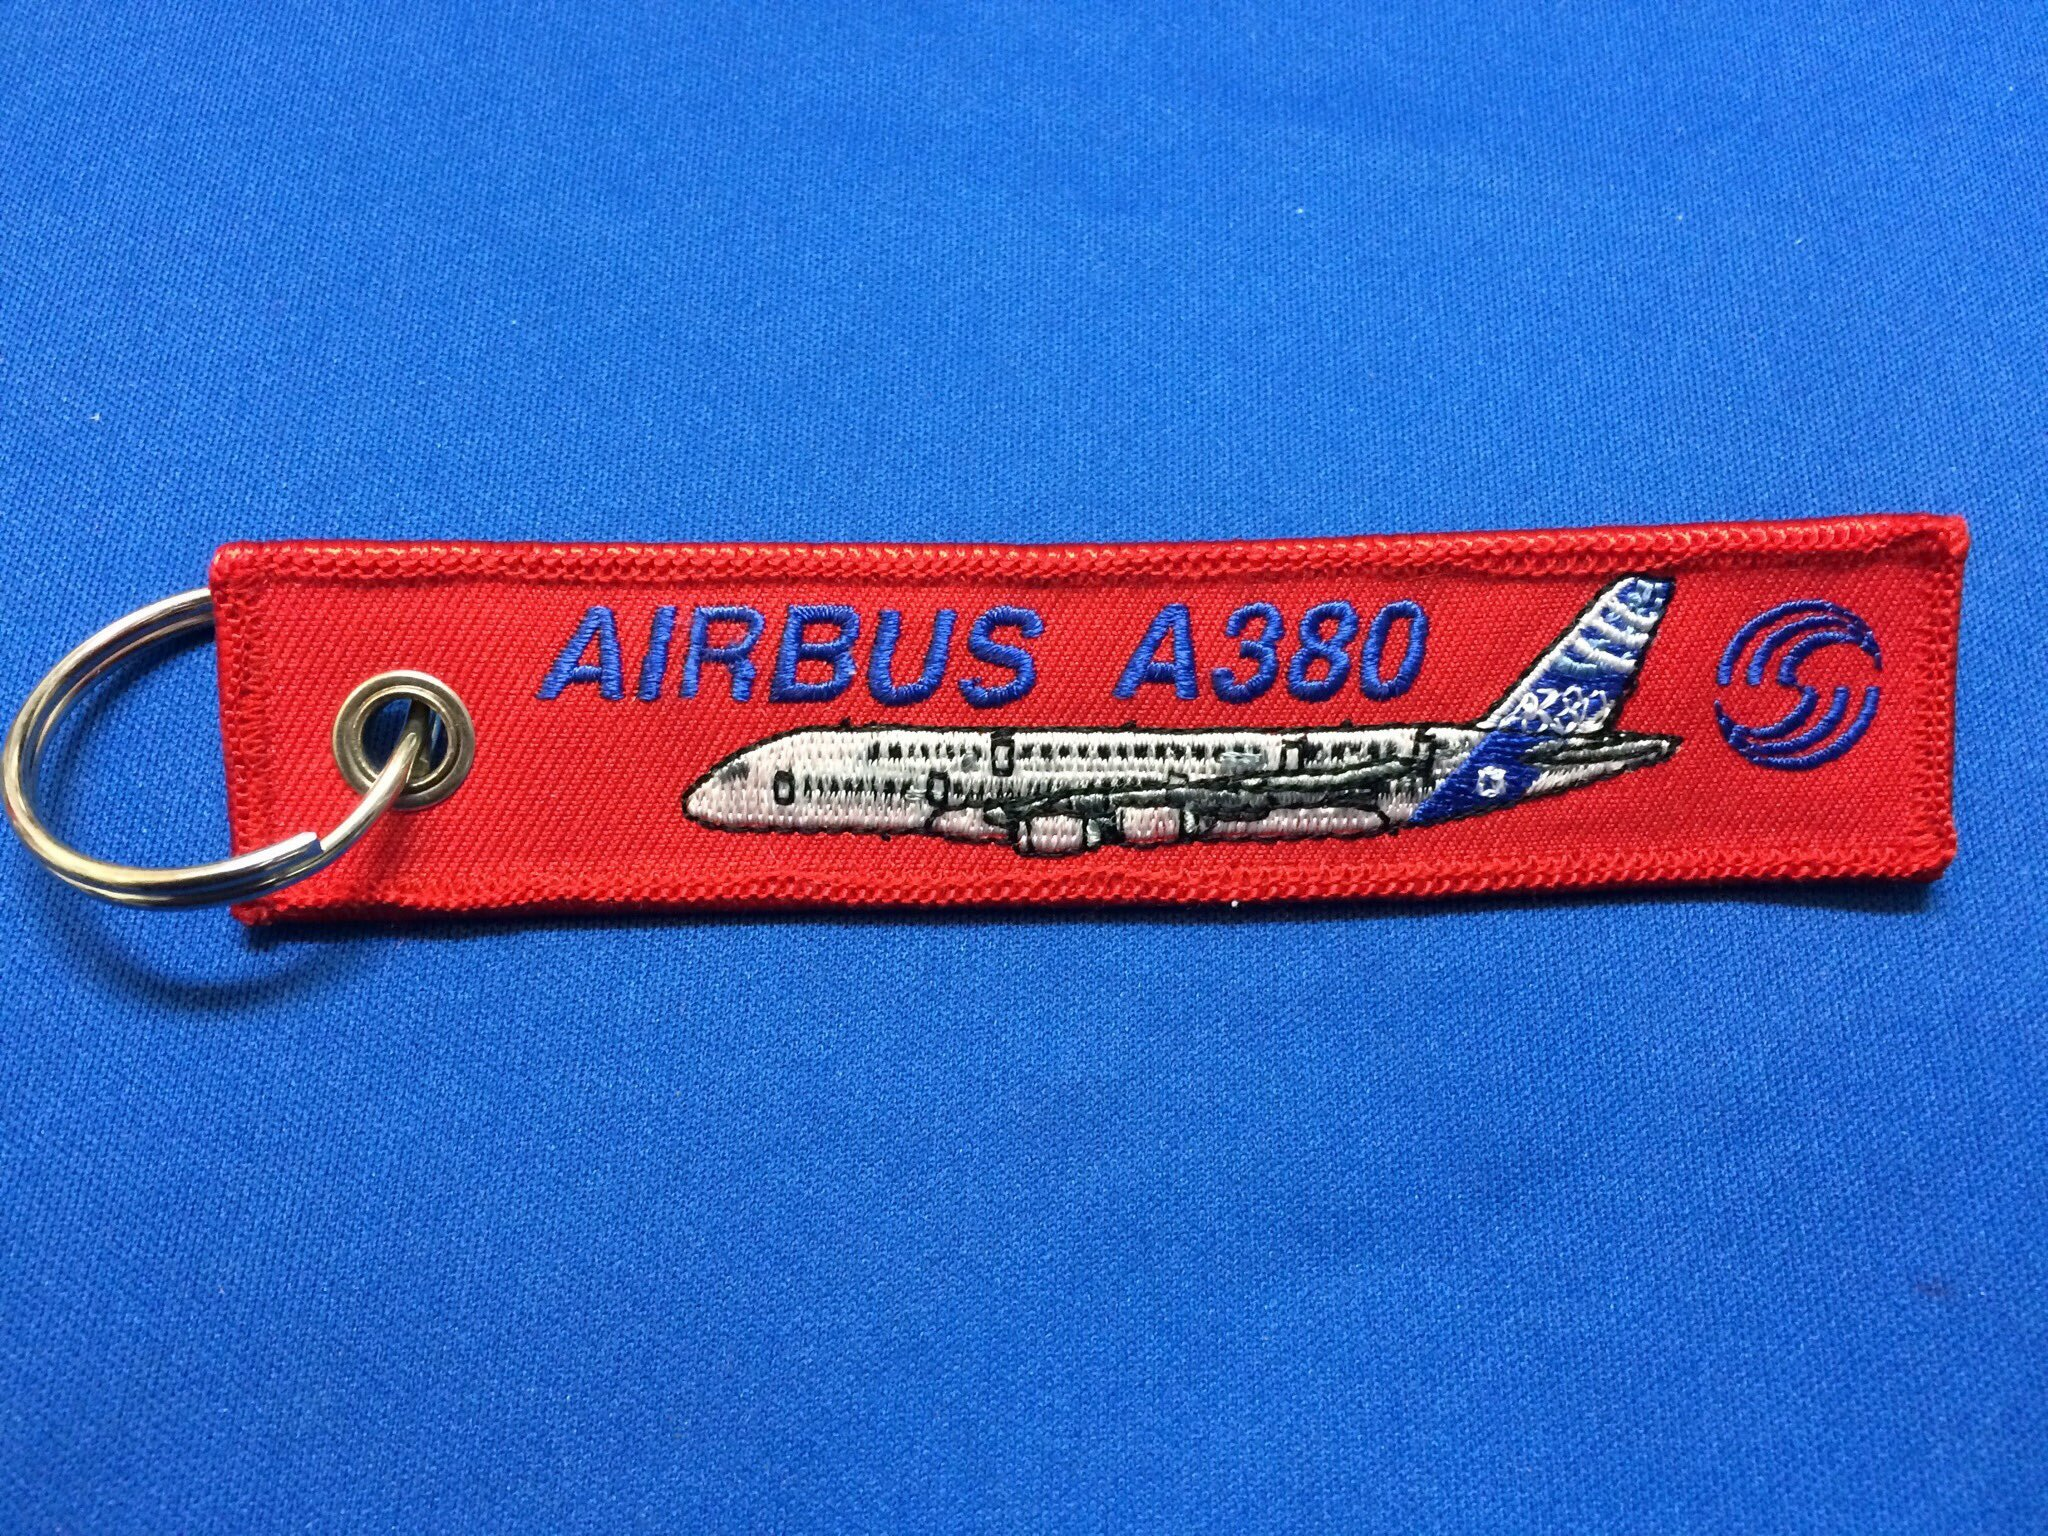 RemoveBeforeFlightキーホルダー/AIRBUS A380